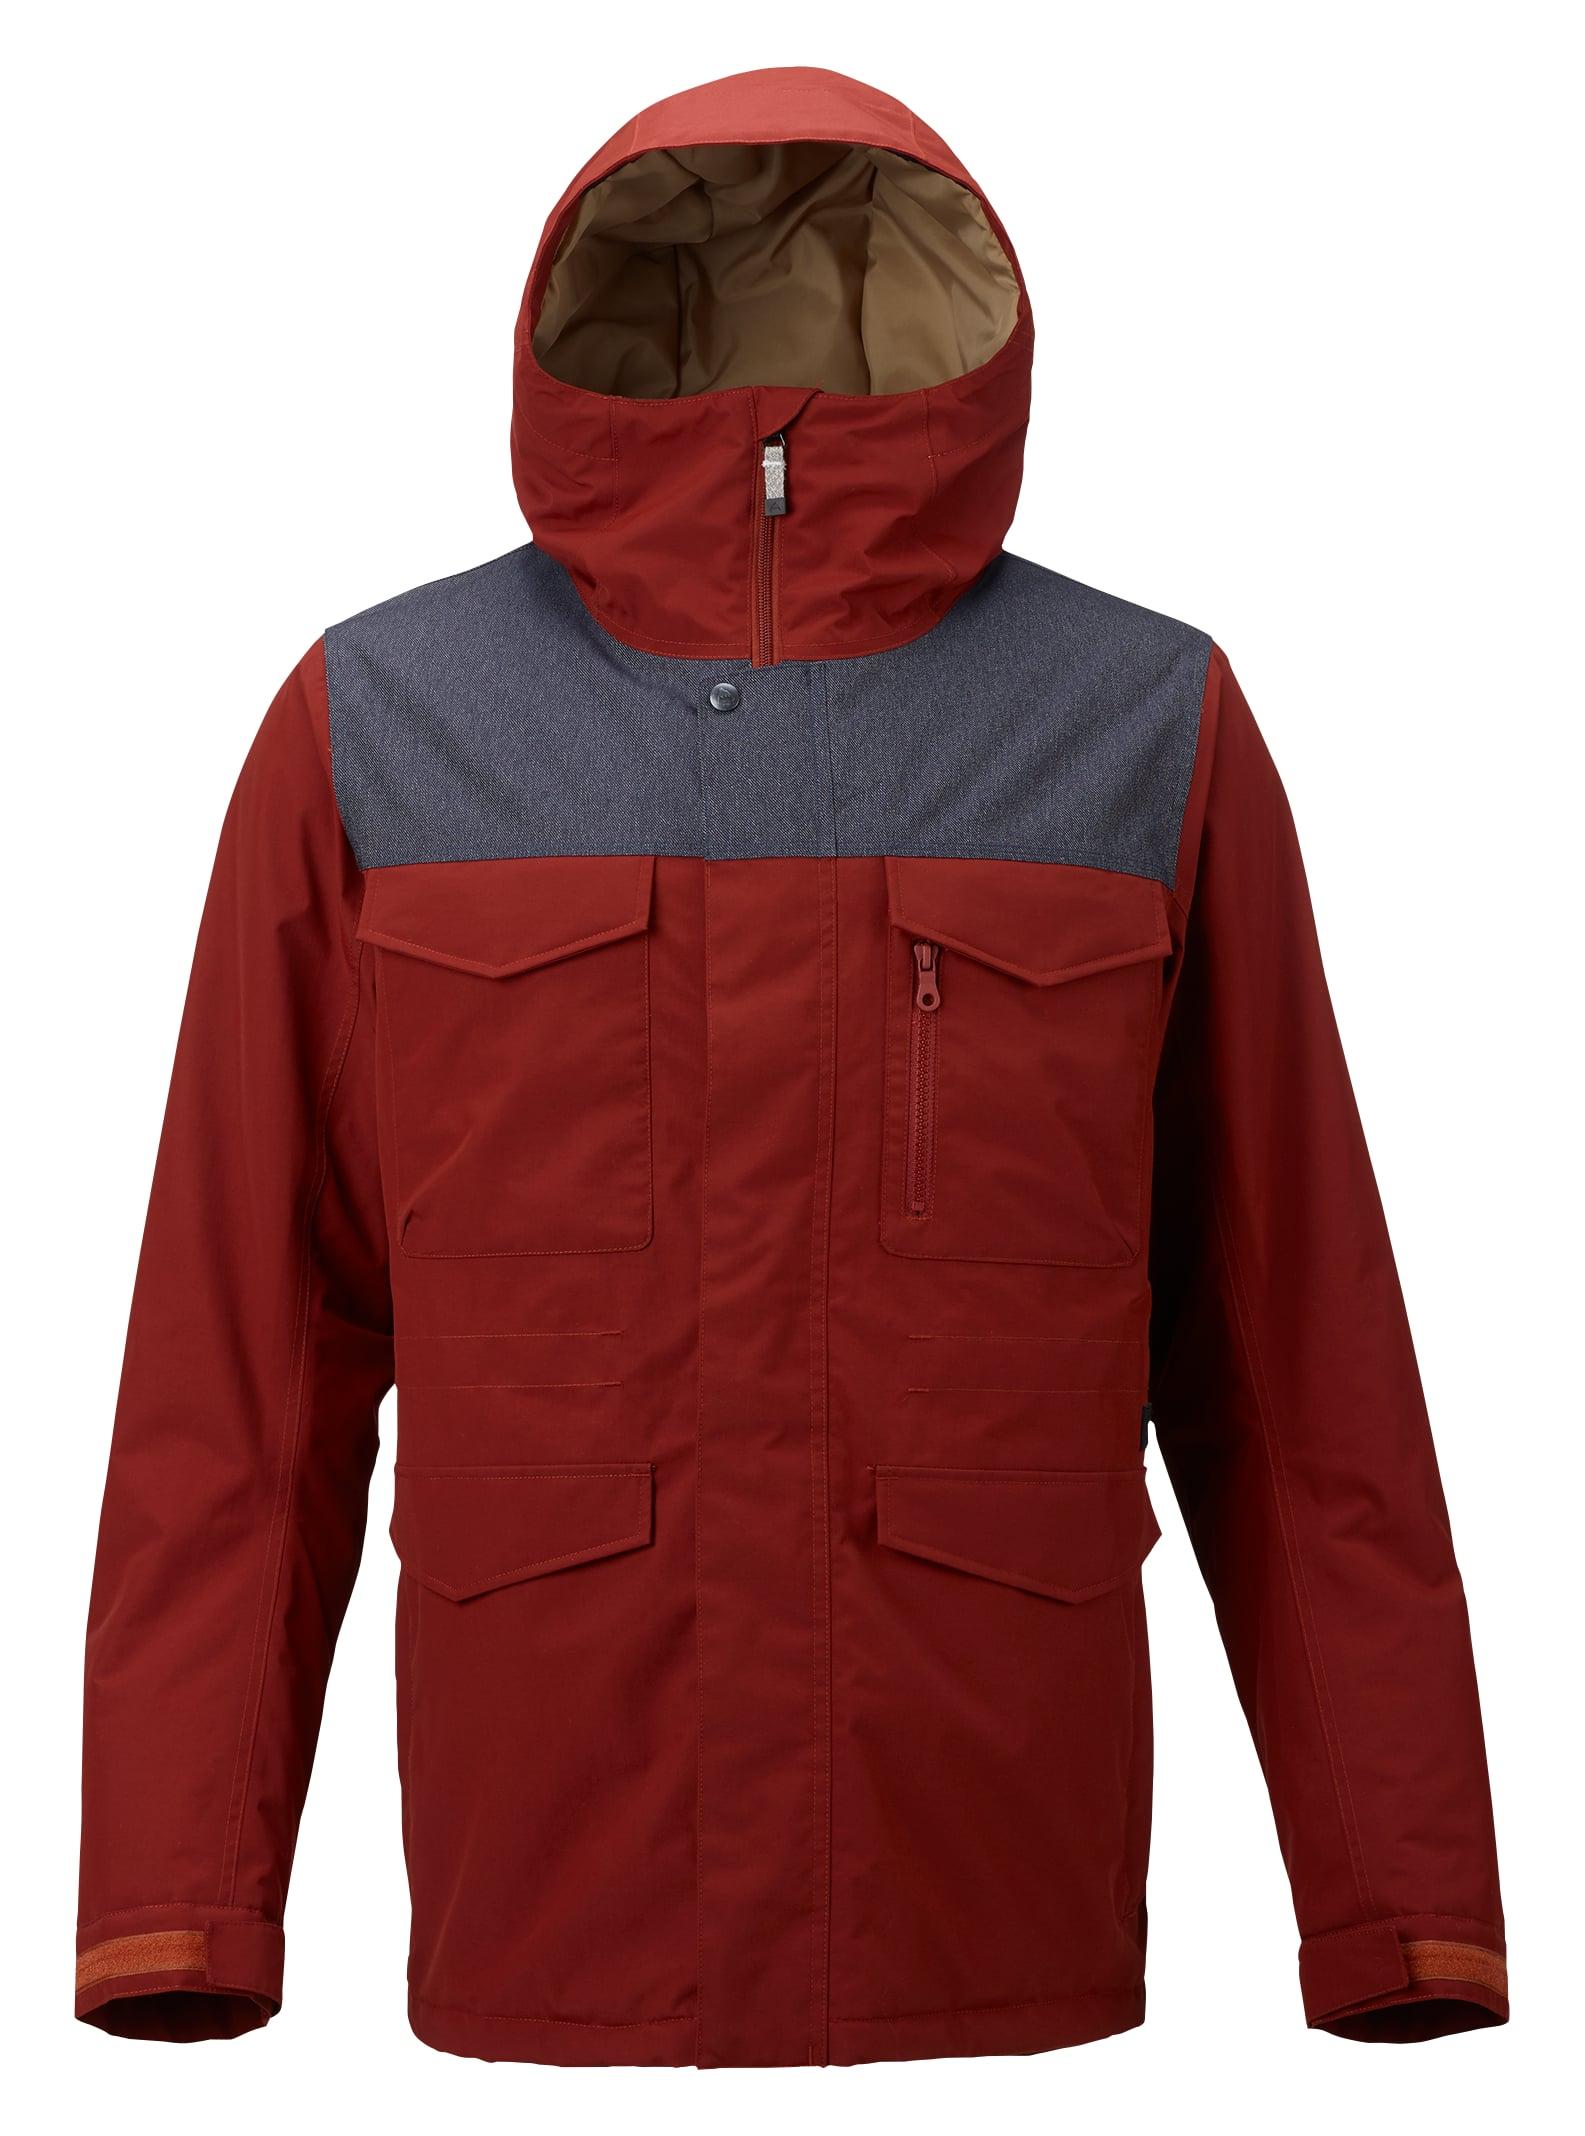 Men's Burton Covert Insulated Jacket